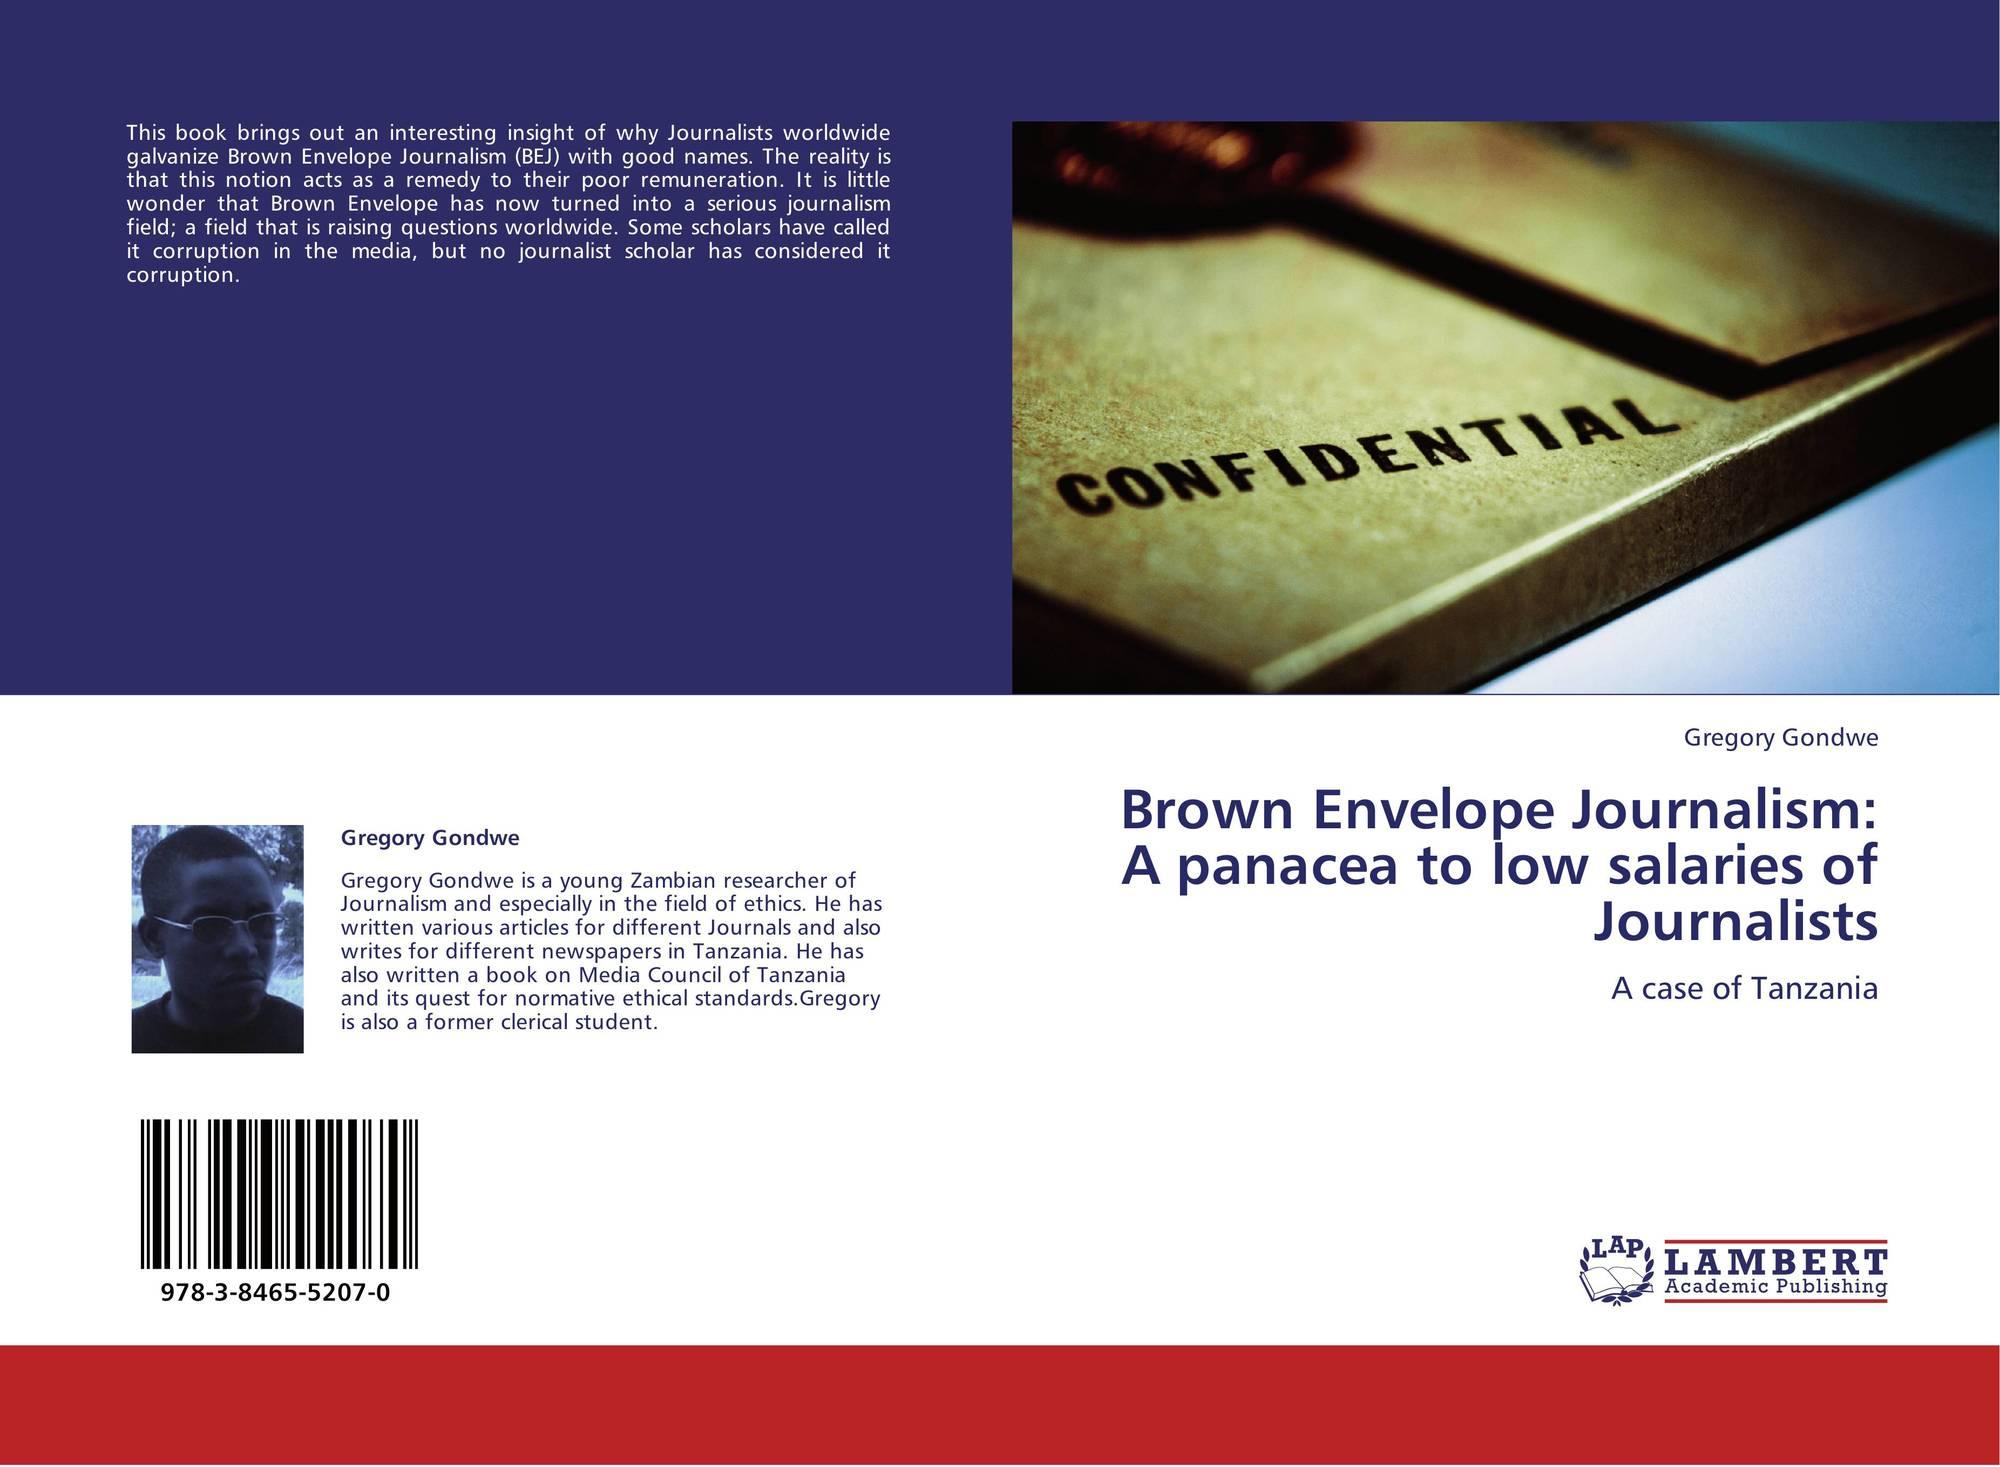 Brown Envelope Journalism a